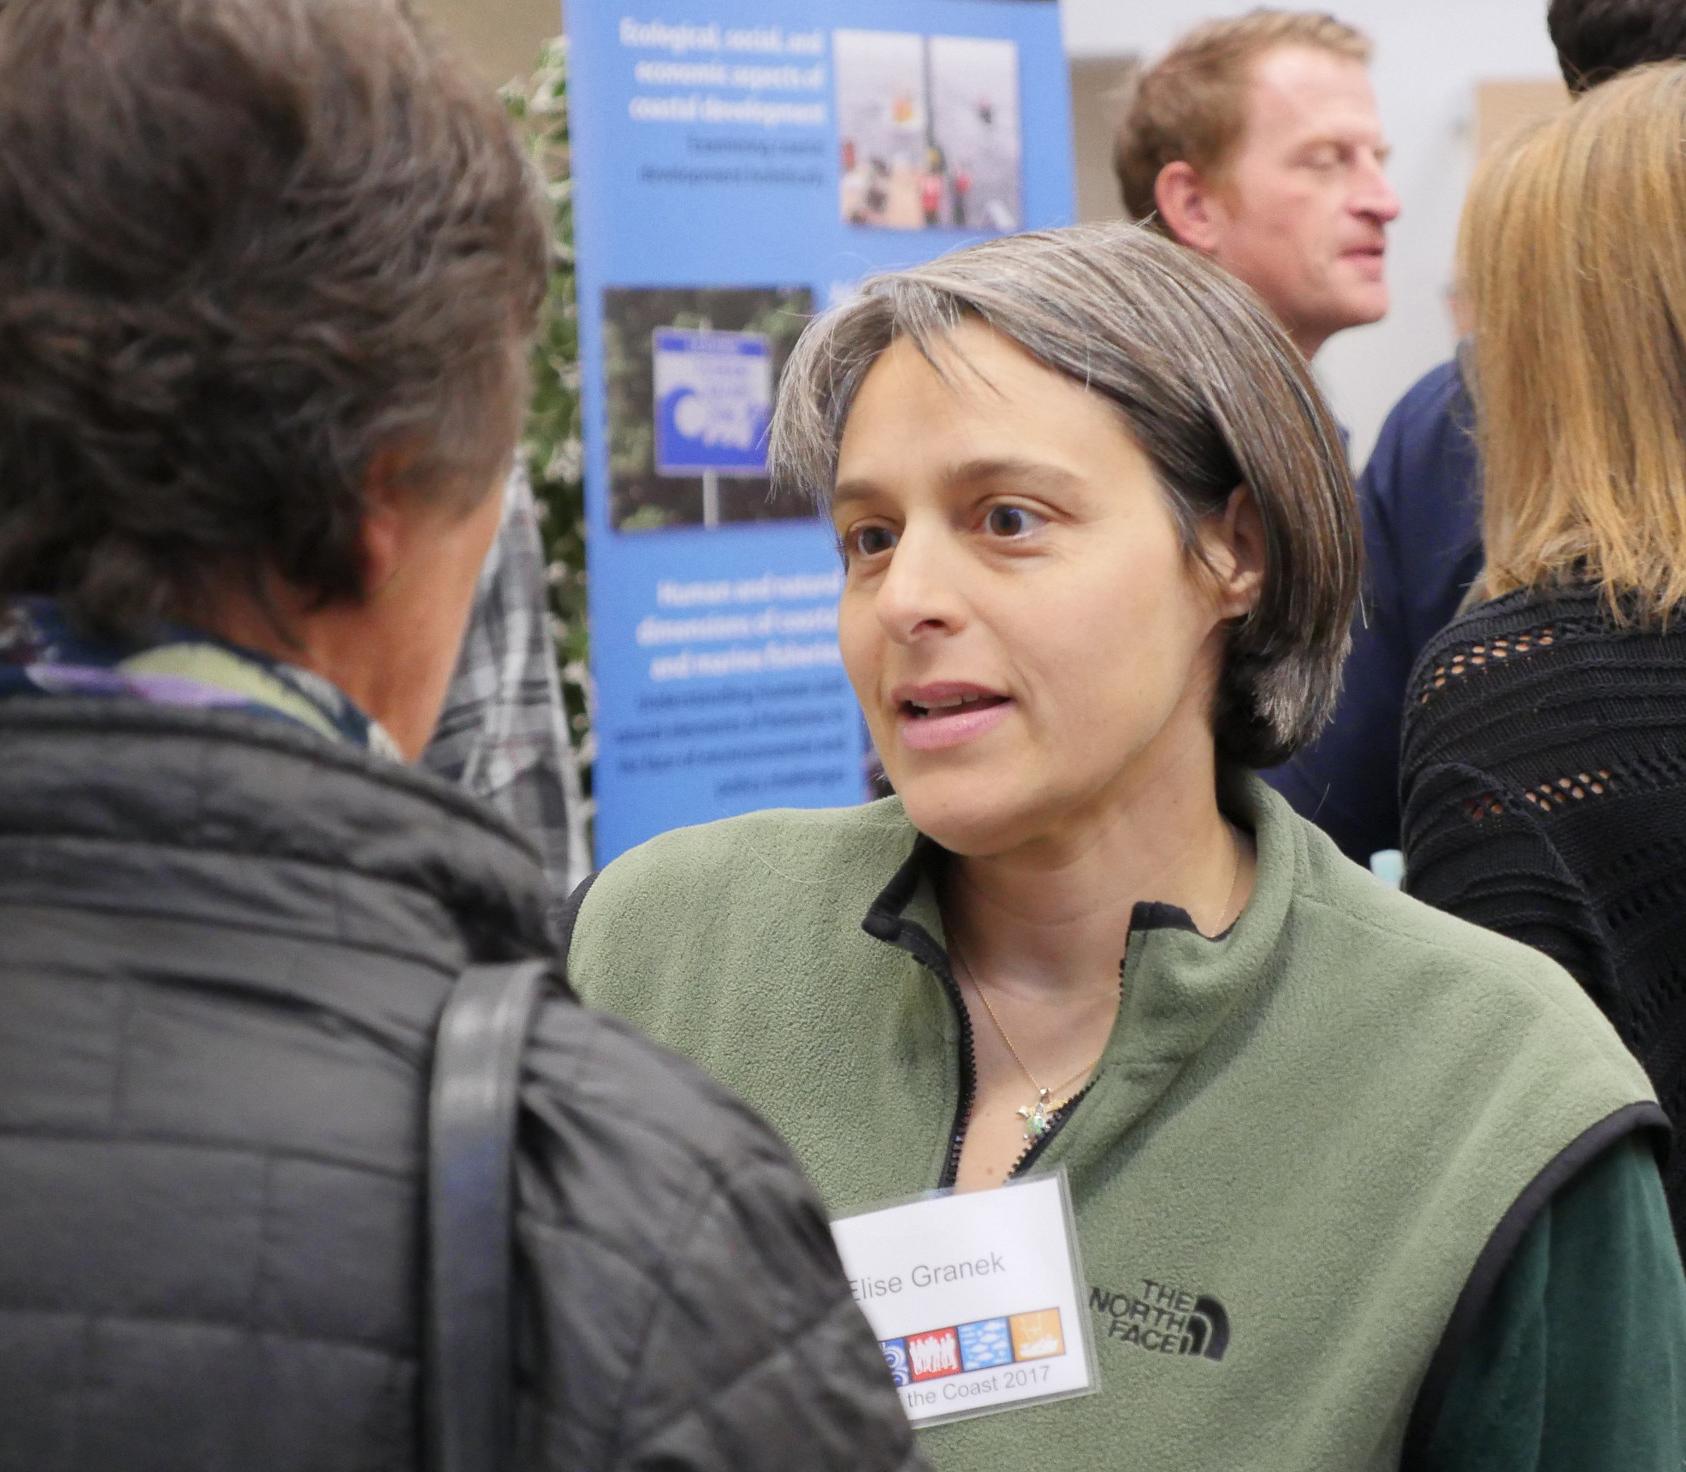 Elise Granek talks to a person